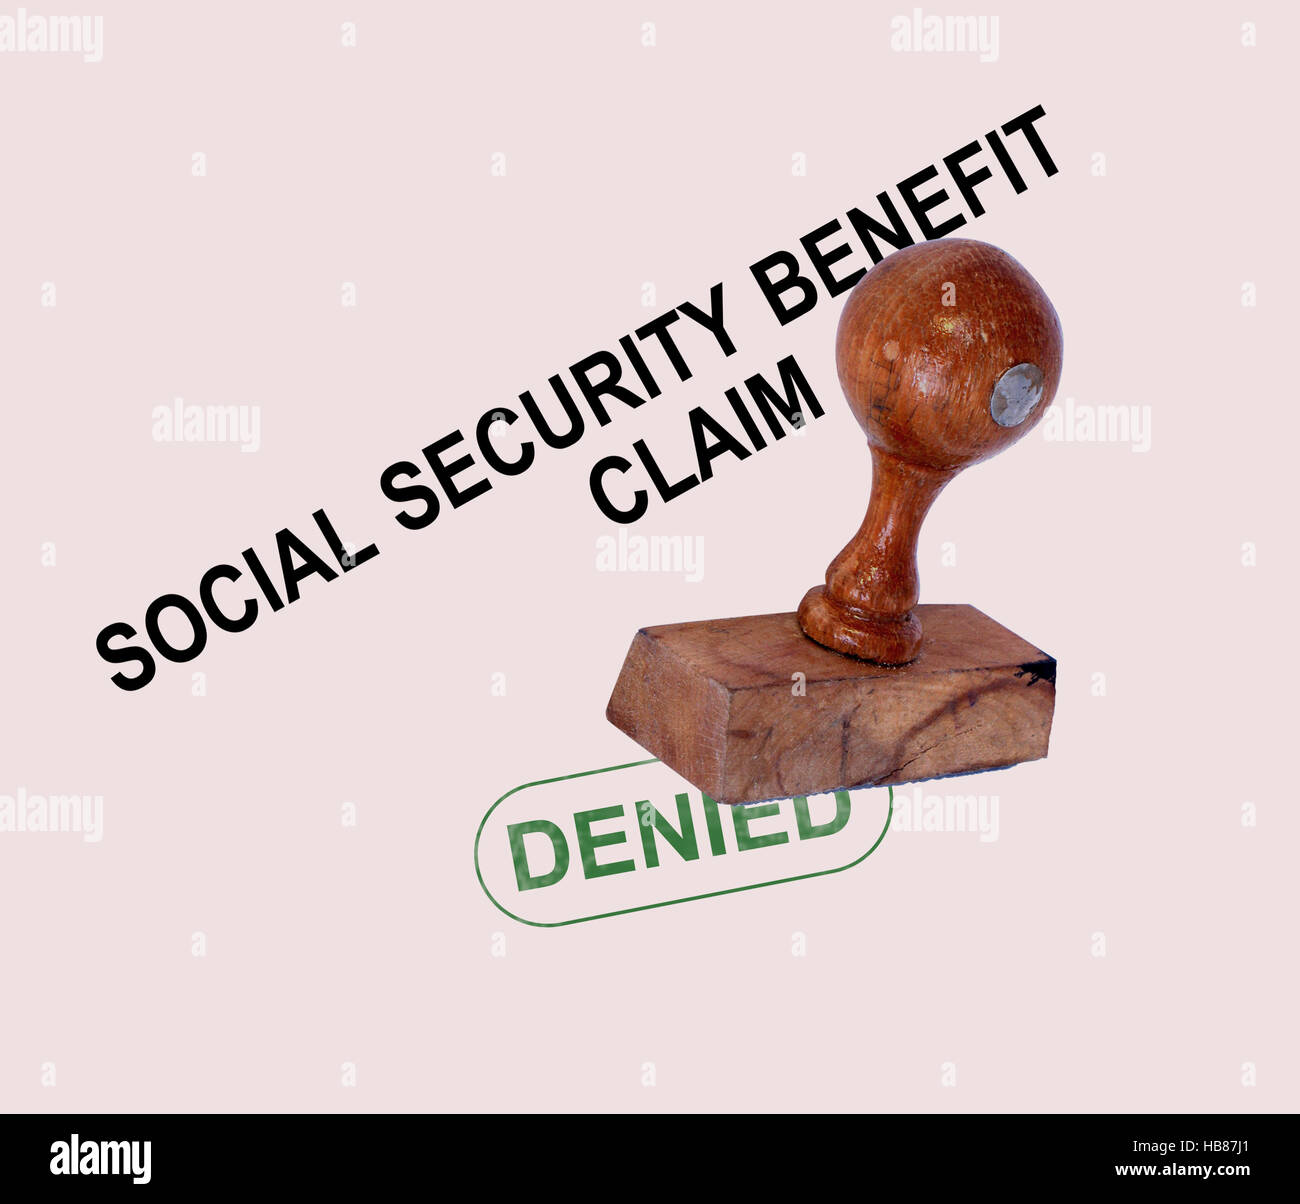 Social Security Claim Denied Stamp - Stock Image